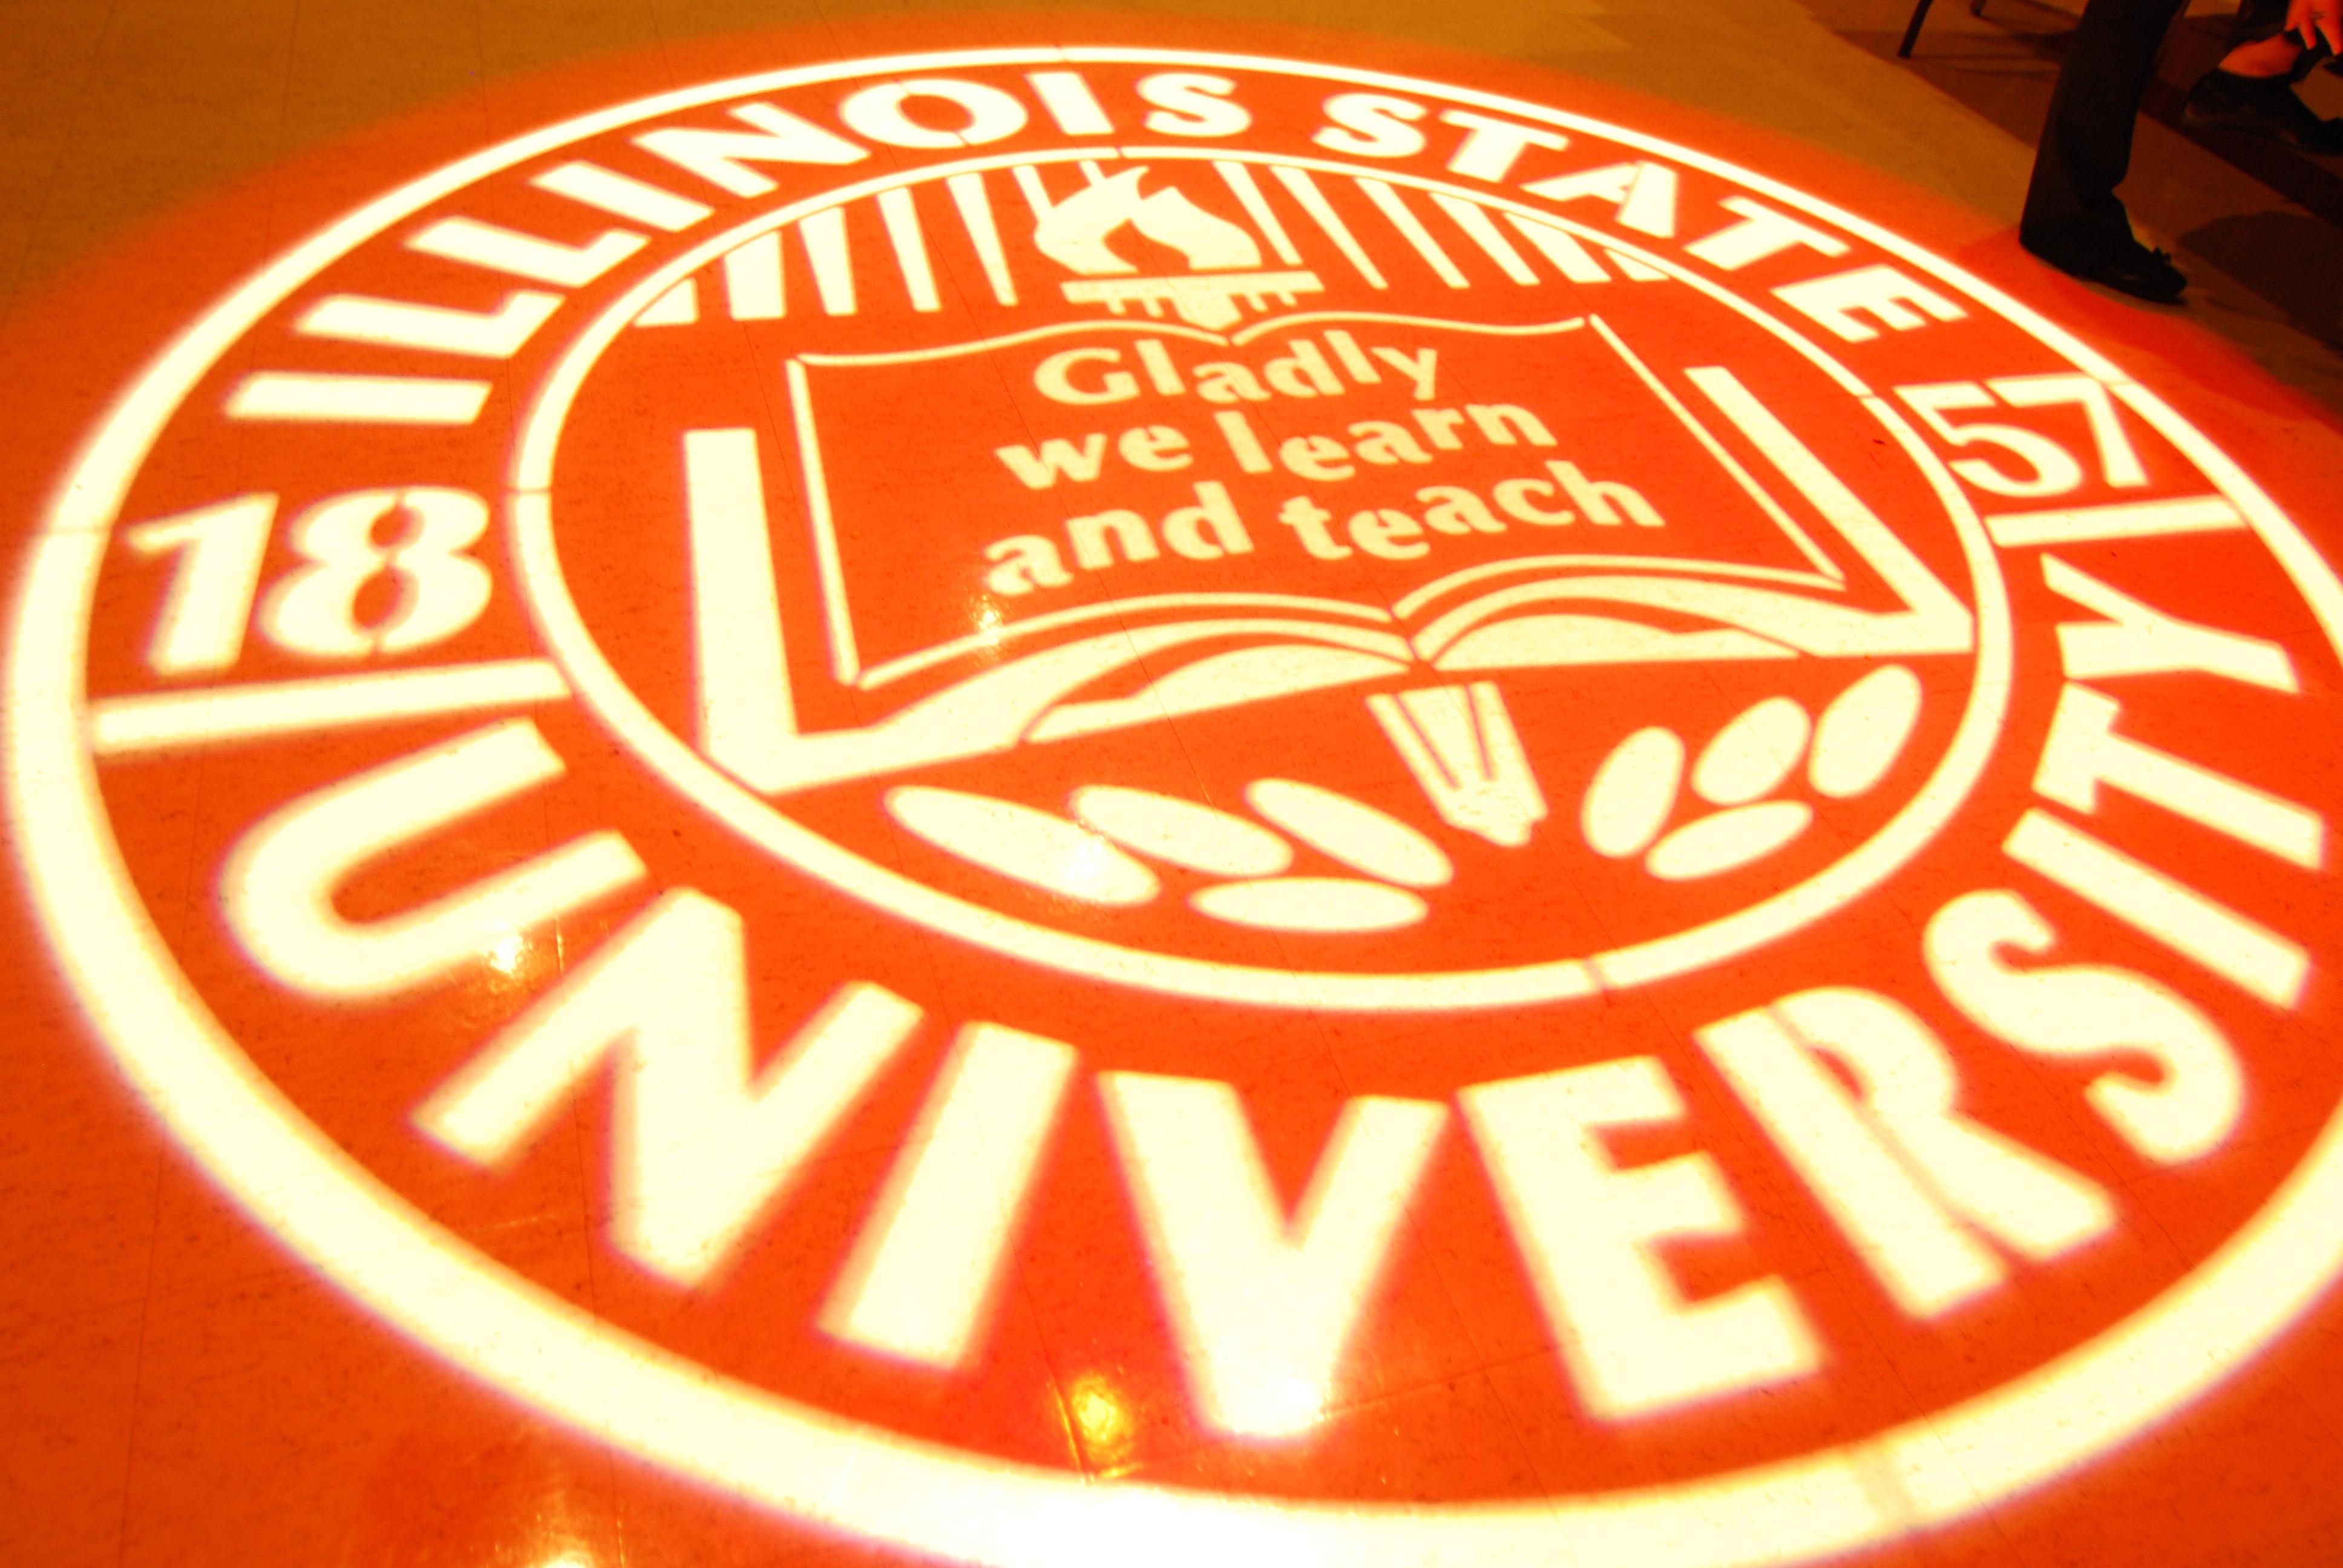 Academic Calendar For Illinois State University inside Illinois State University Calendar 2021